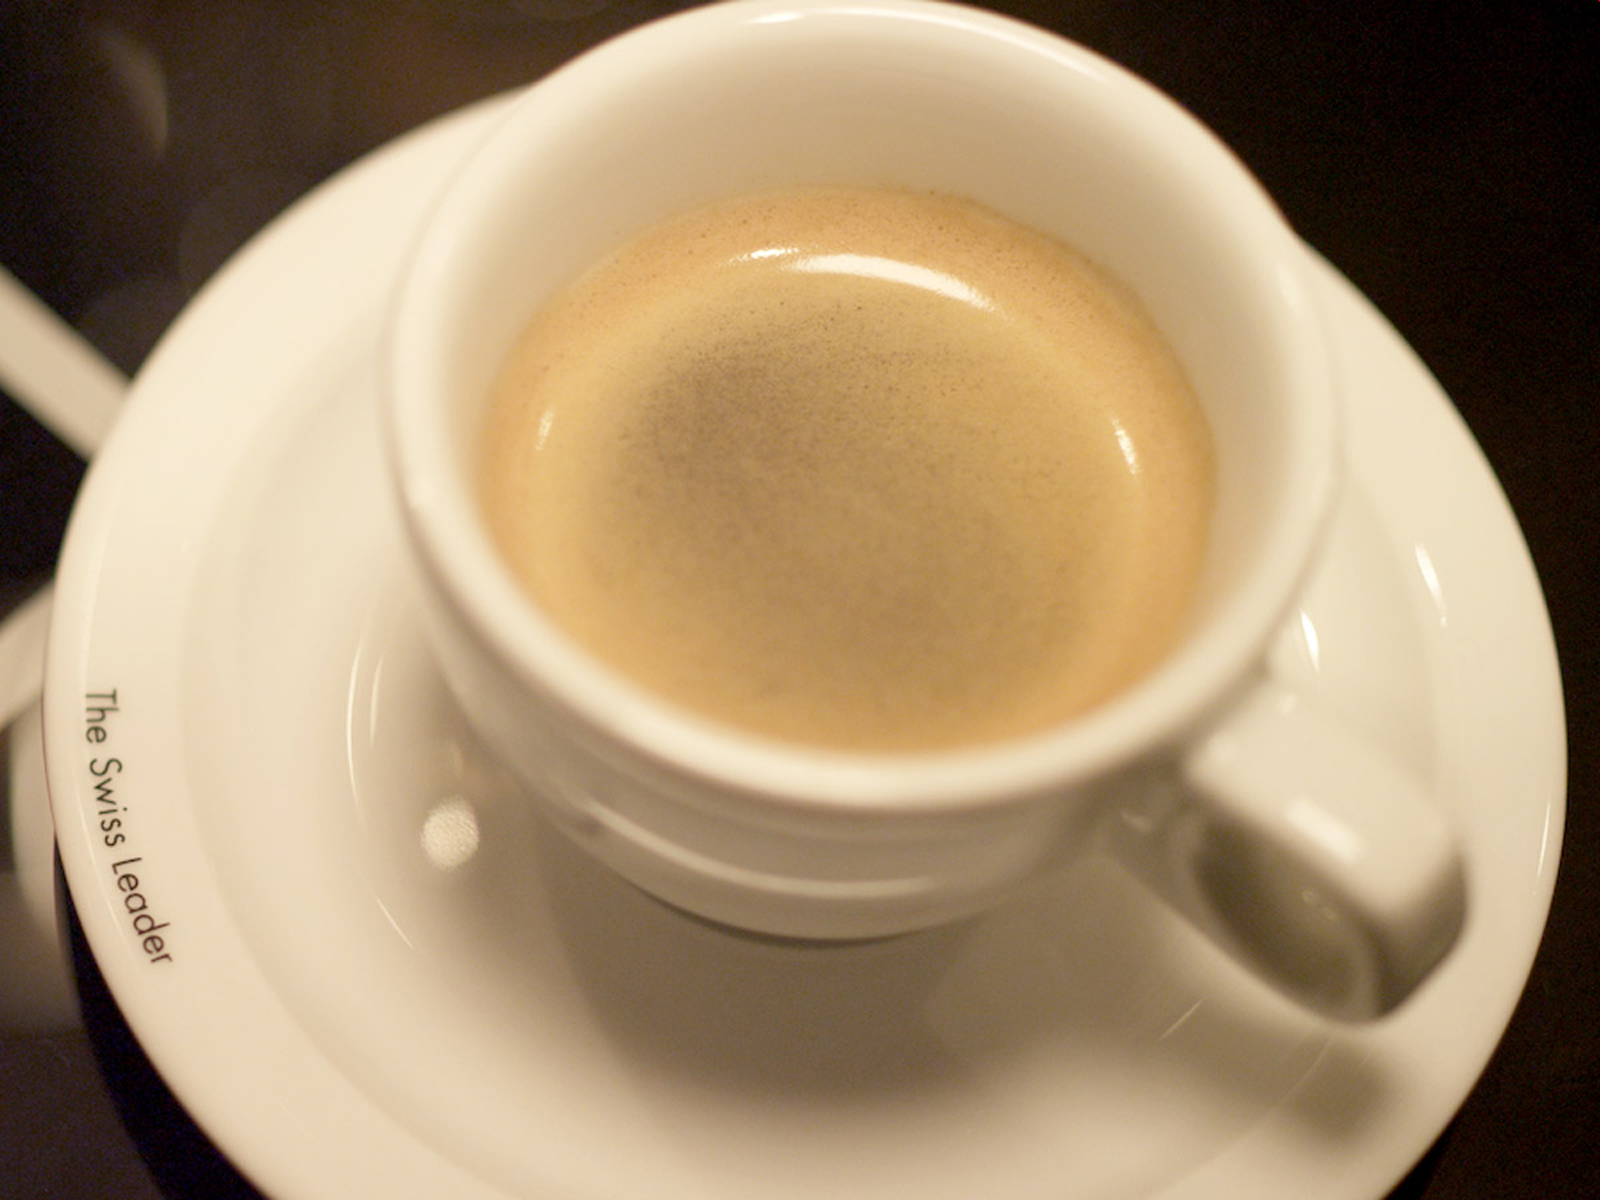 V-ZUG Supremo XSL Einbau-Espresso-/Kaffeevollautomat ChromeClass